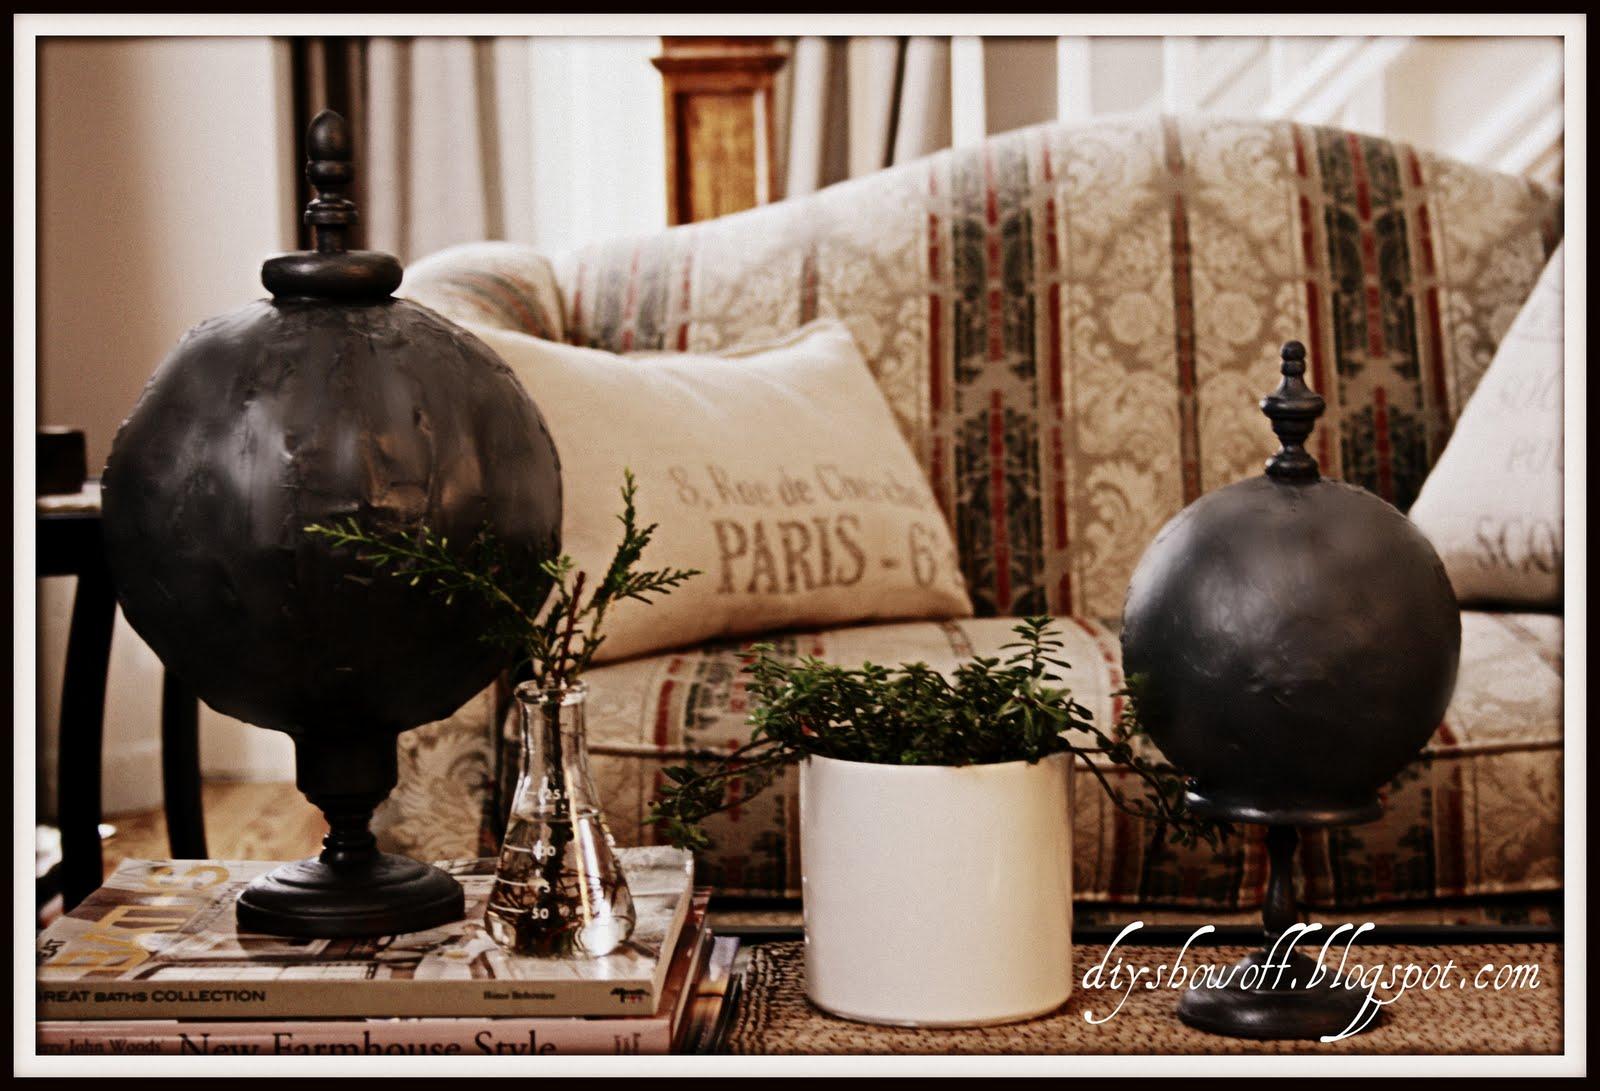 Decorative Spheres Diy Show Off Diy Decorating And